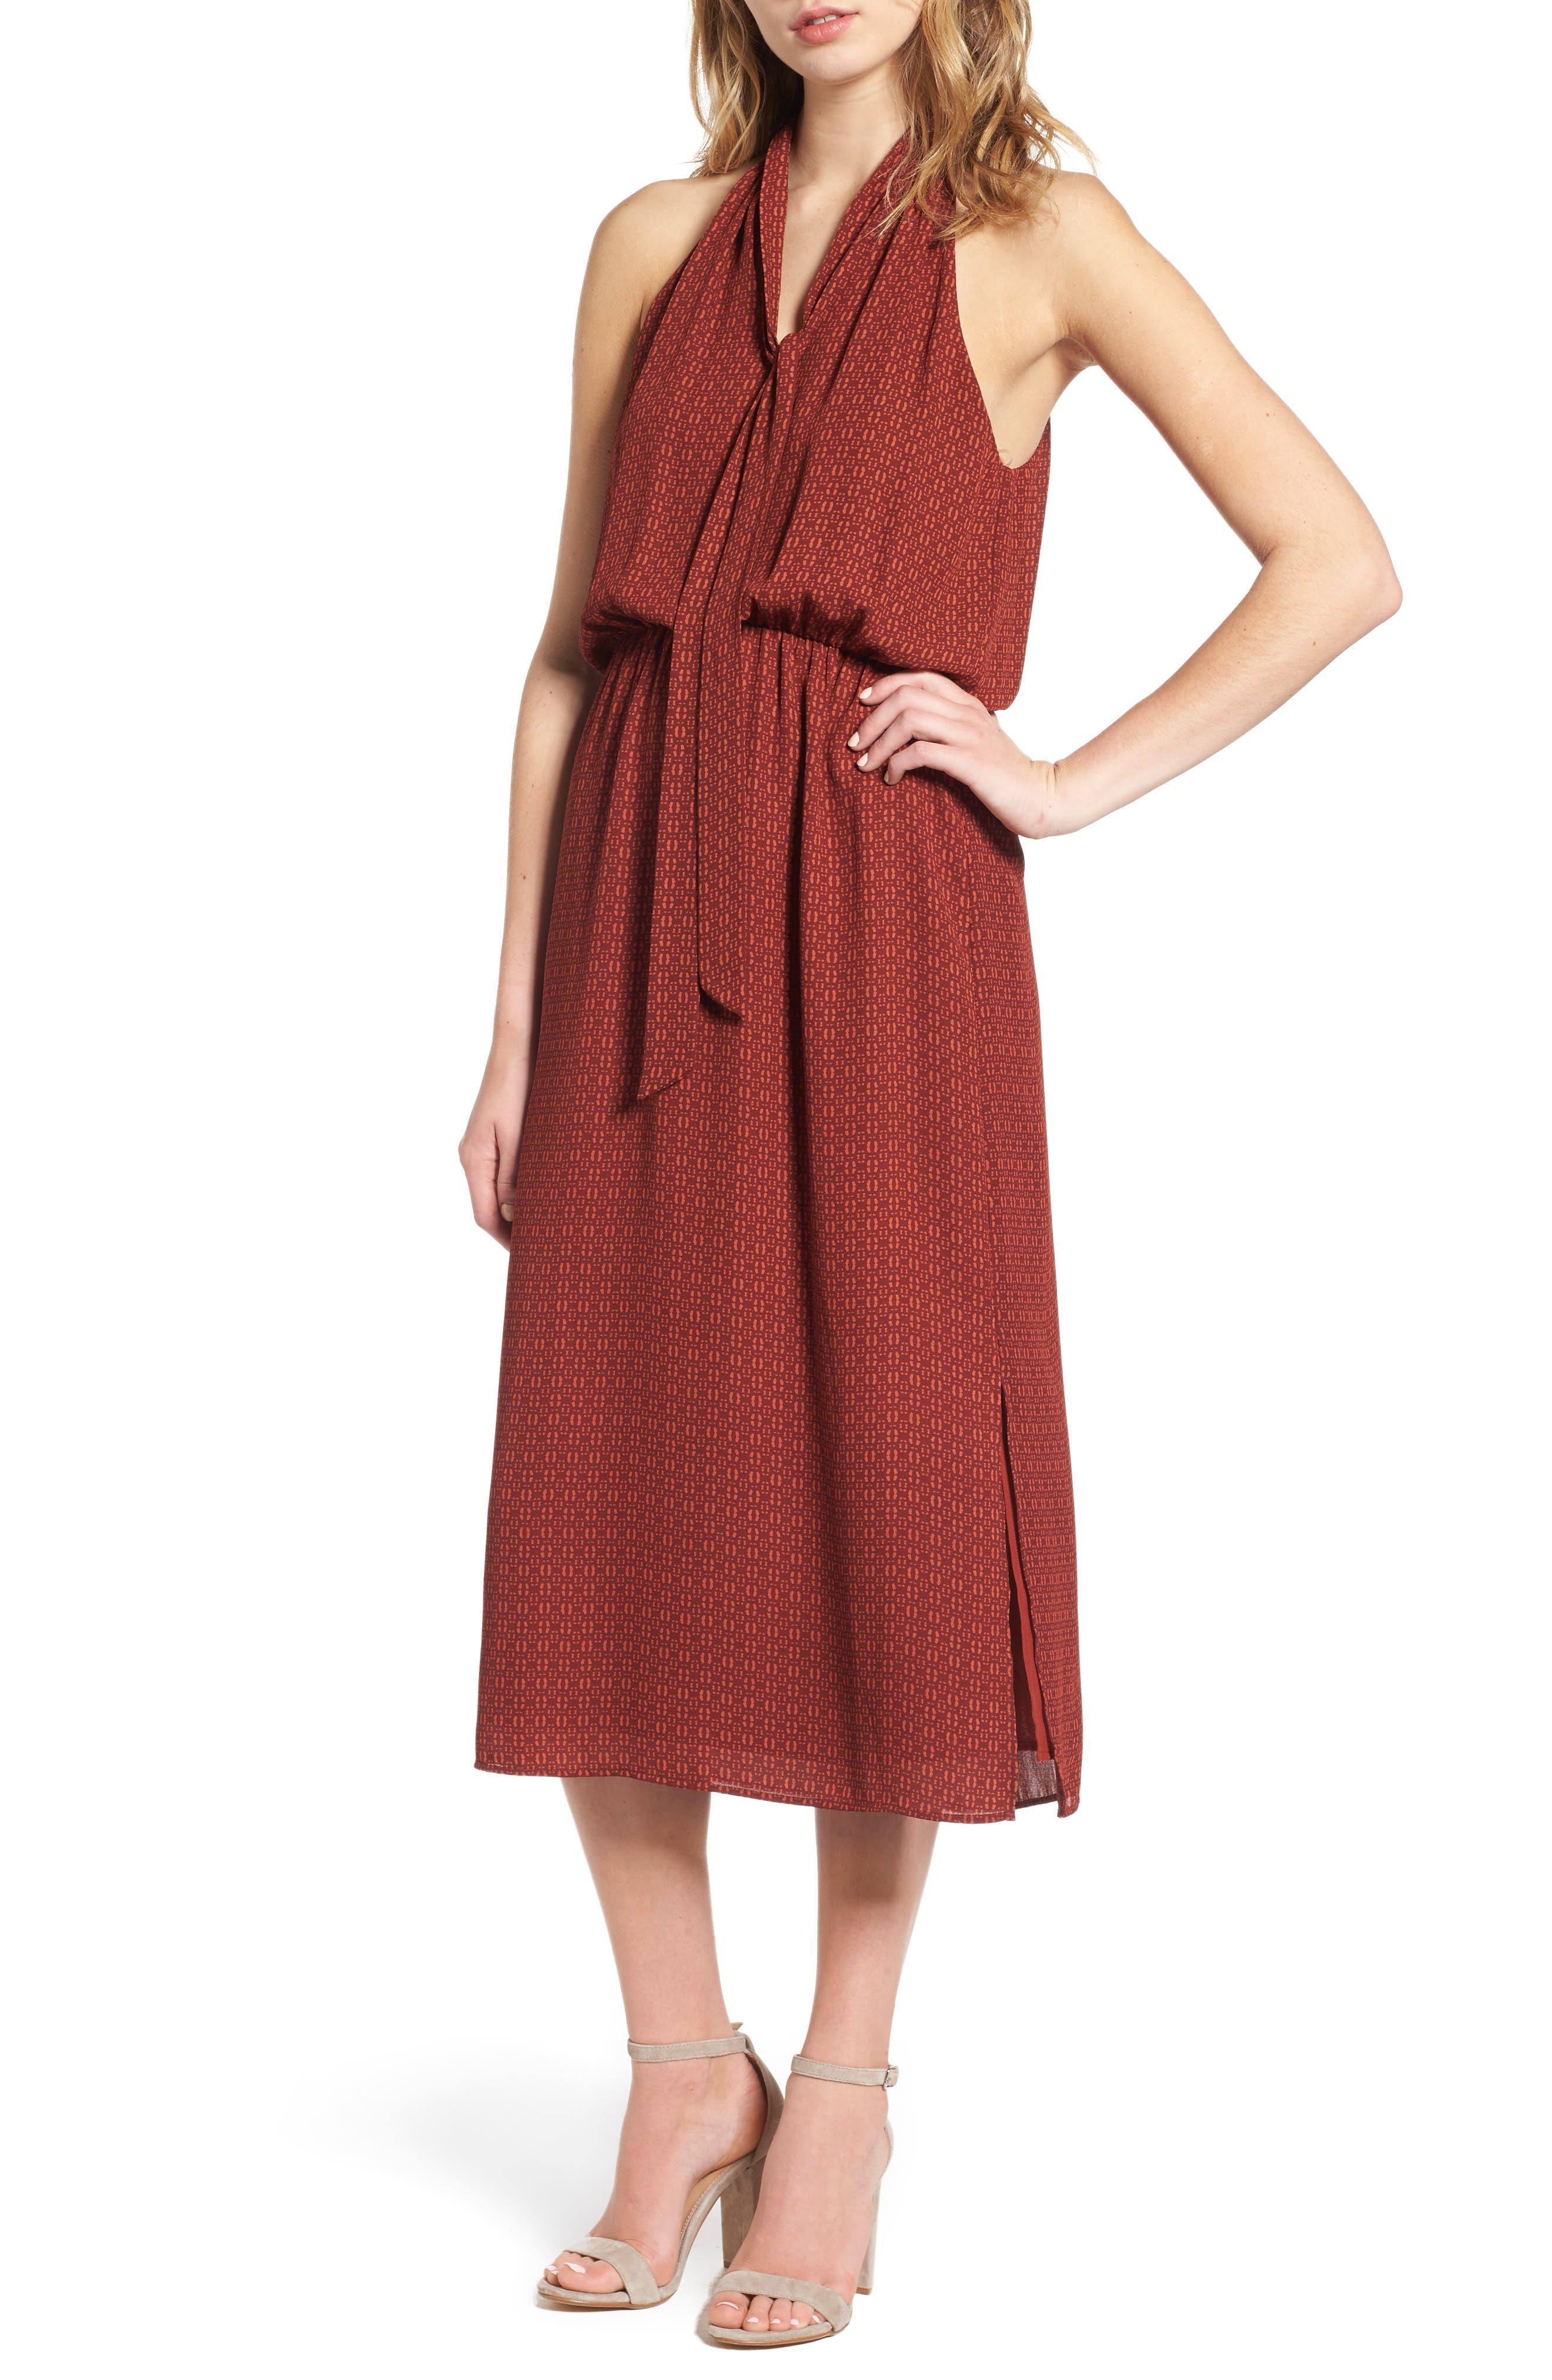 Everly Tie Neck Midi Dress